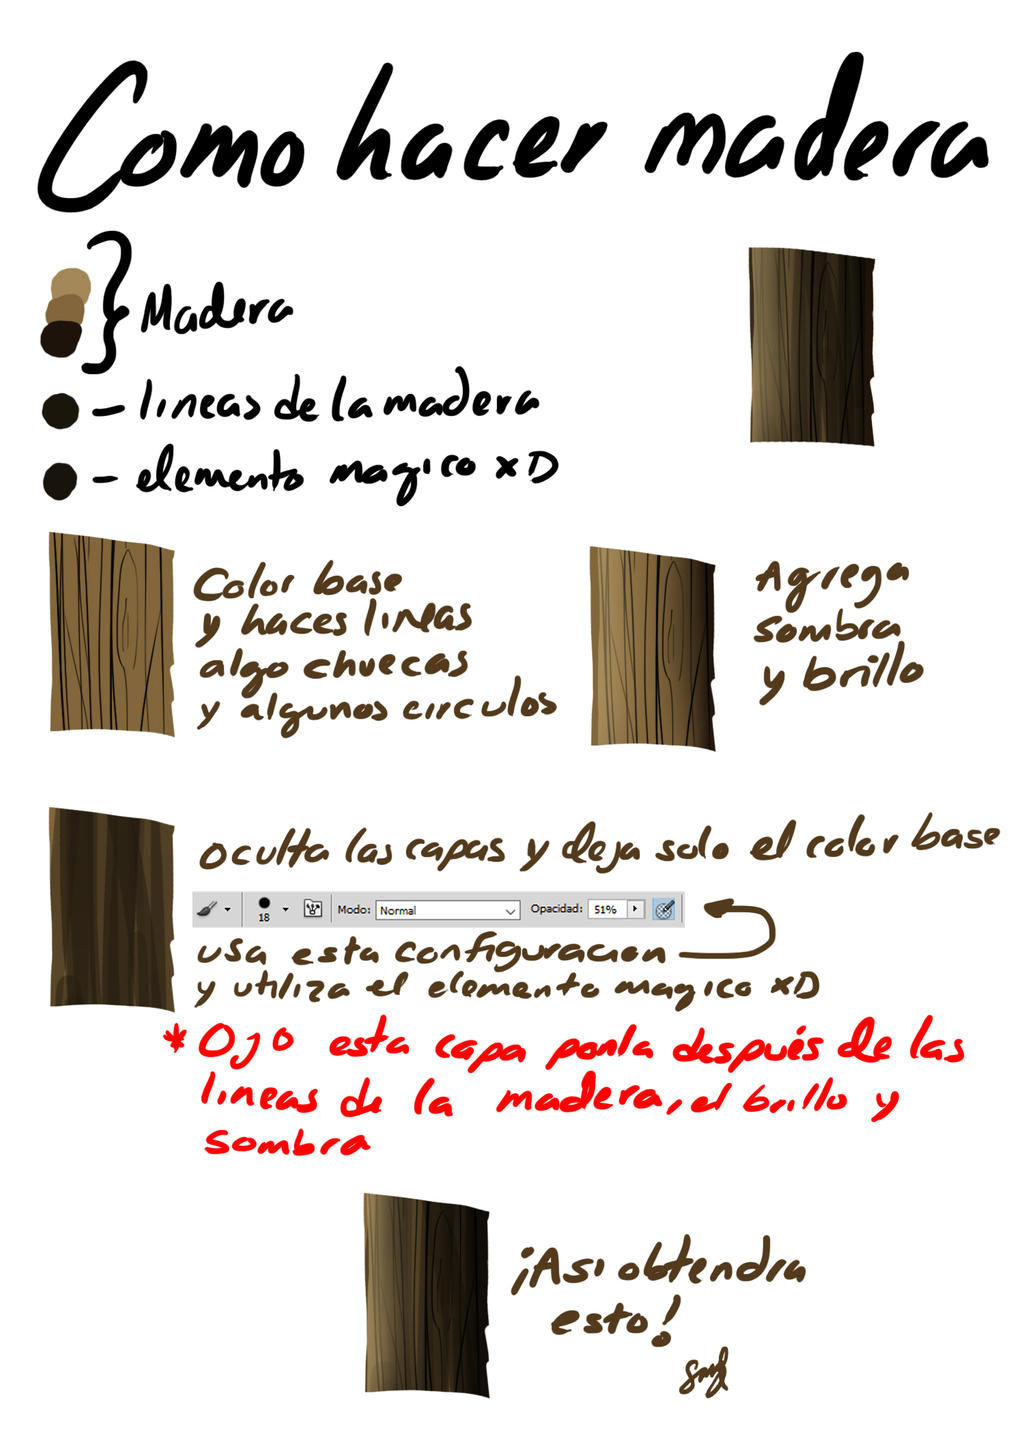 Tutorial| Como hacer madera by Selanime